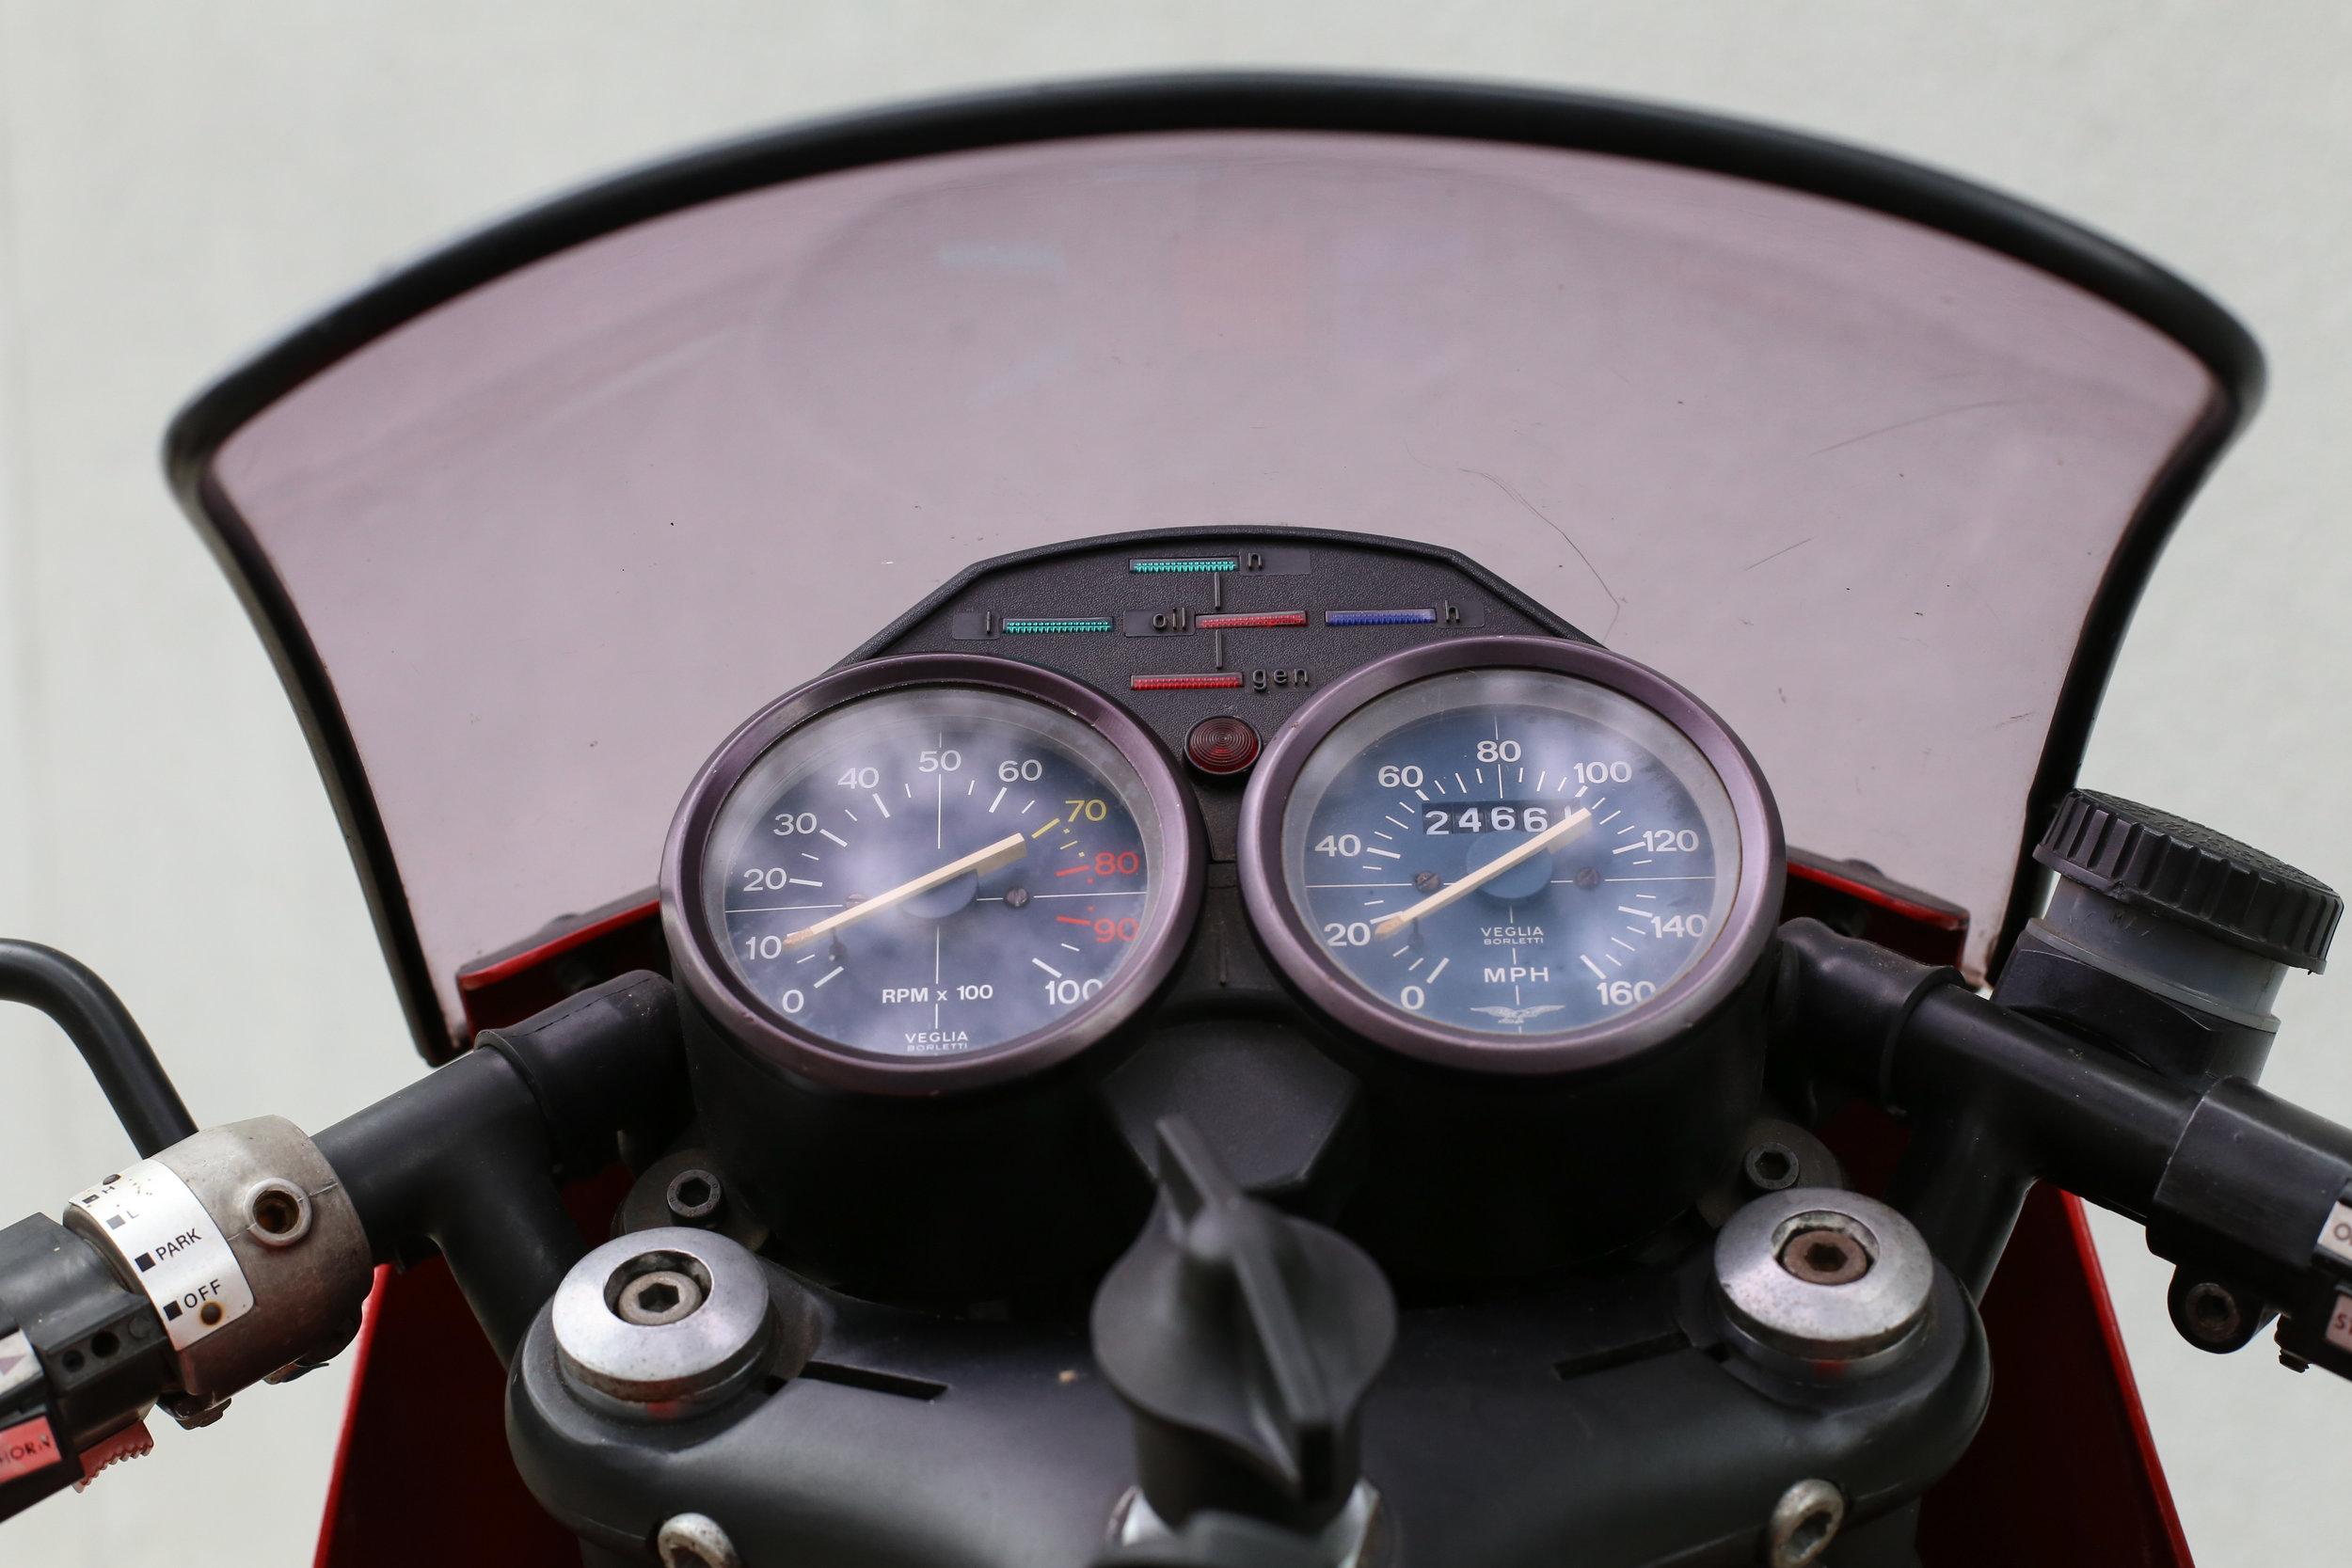 1978 Moto Guzzi Lemans 1 speedo